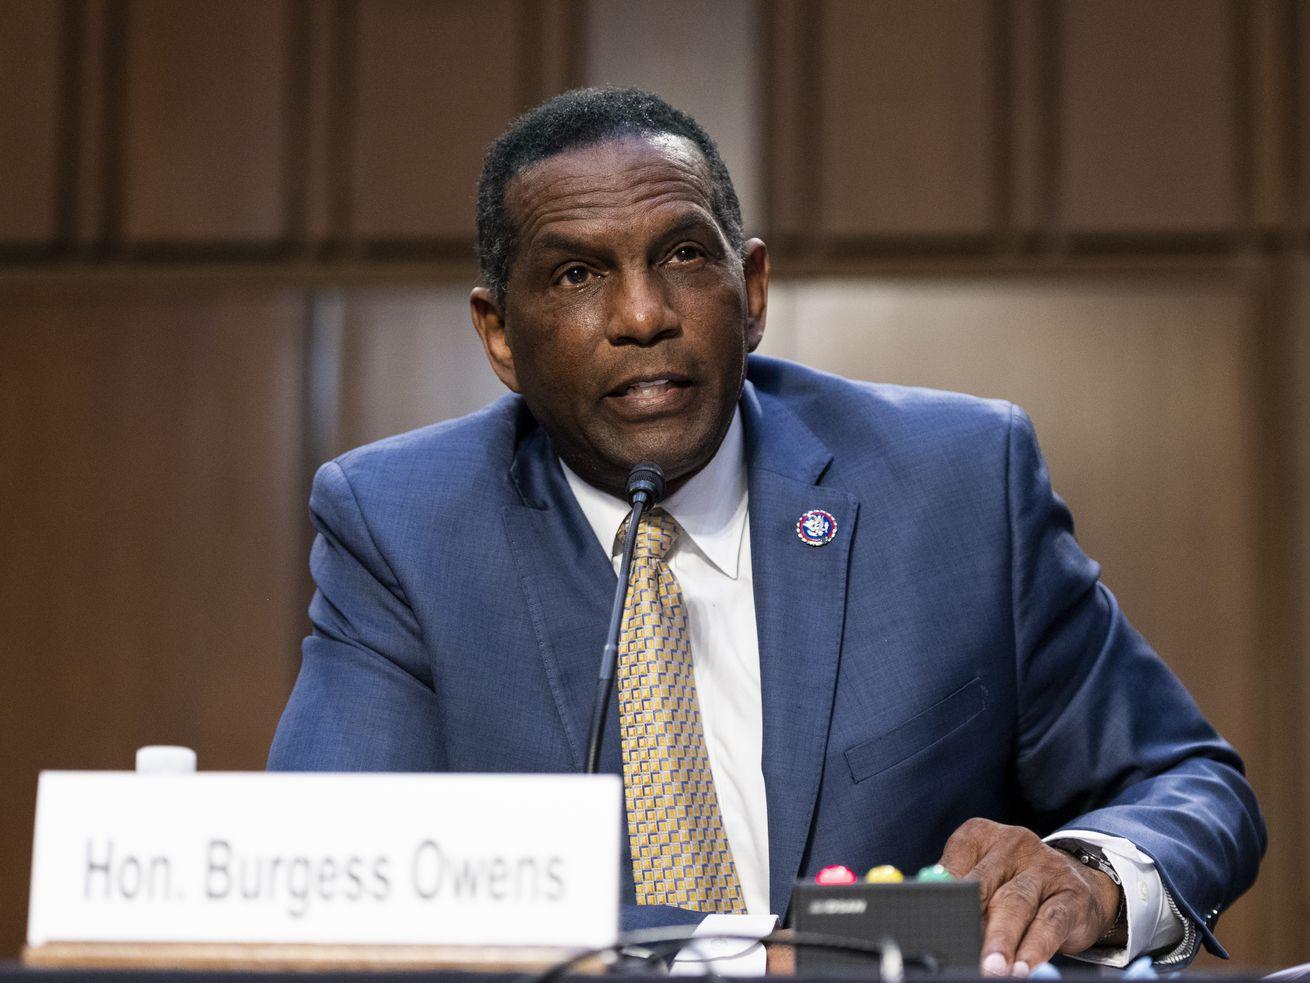 Rep. Burgess Owens, R-Utah, speaks during a Senate Judiciary Committee in Washington on Tuesday, April 20, 2021.